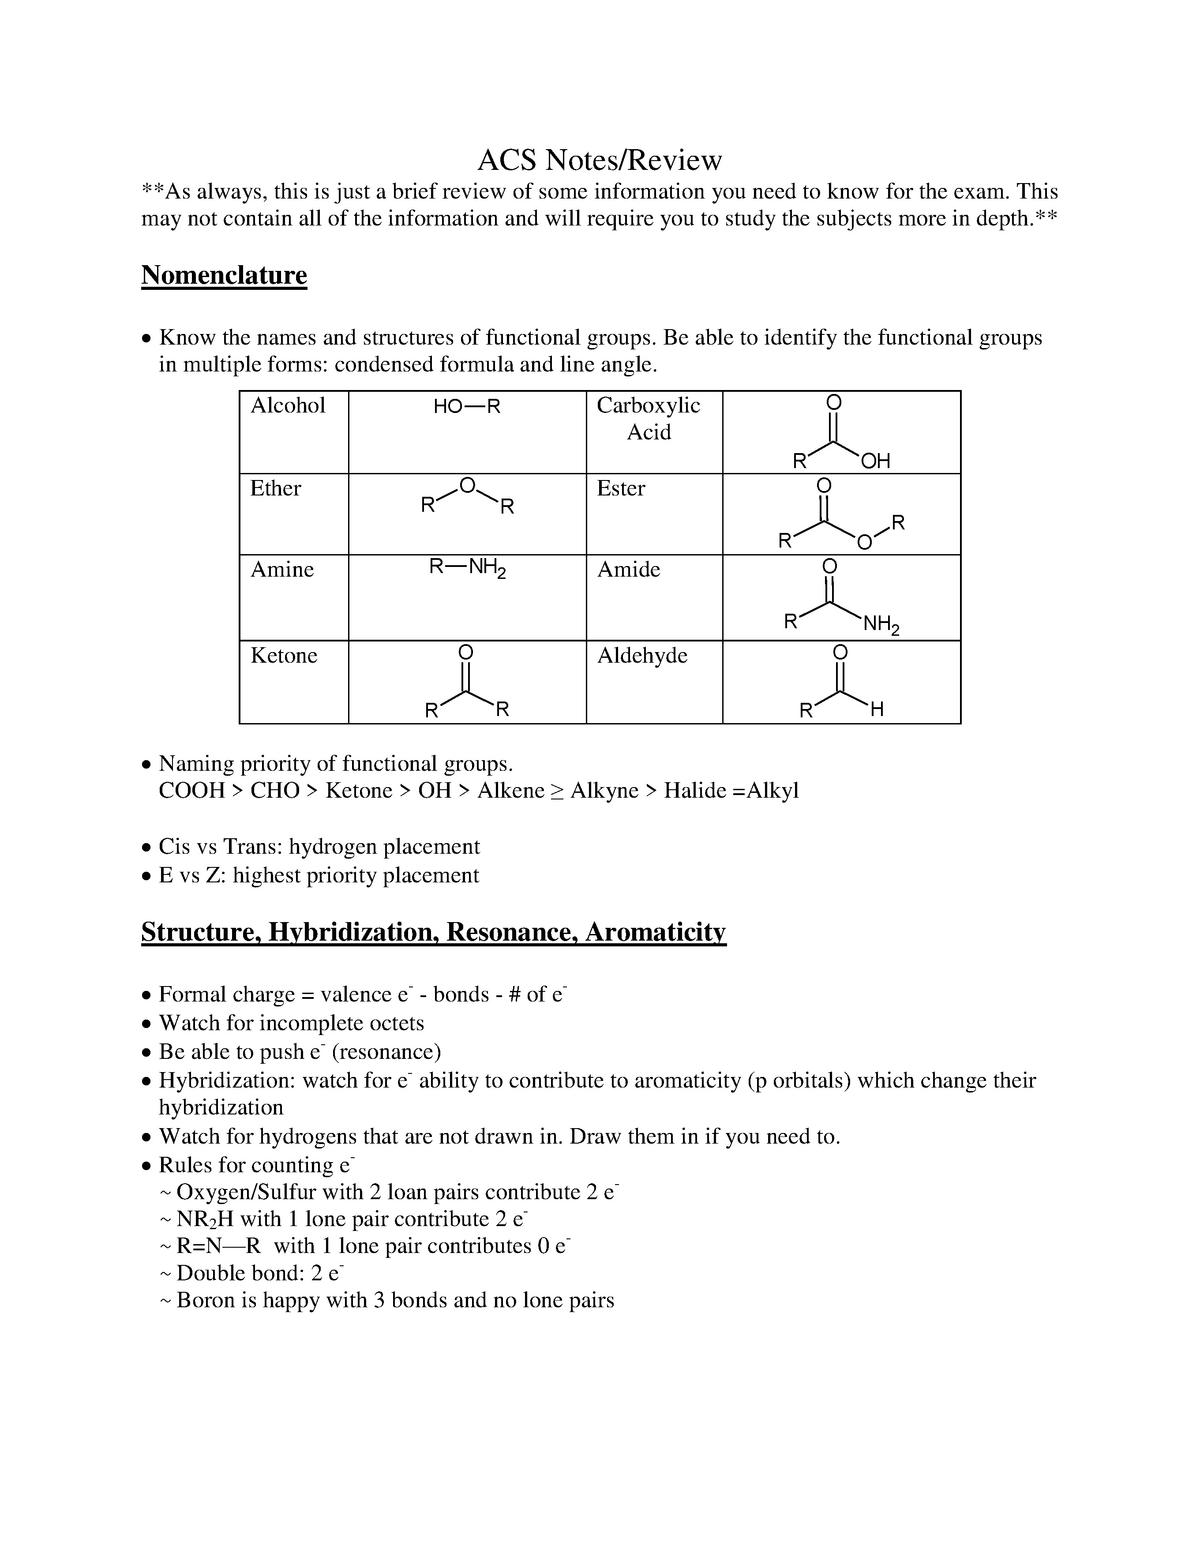 ACS Review - CH 237 Organic Chemistry II - UAB - StuDocu